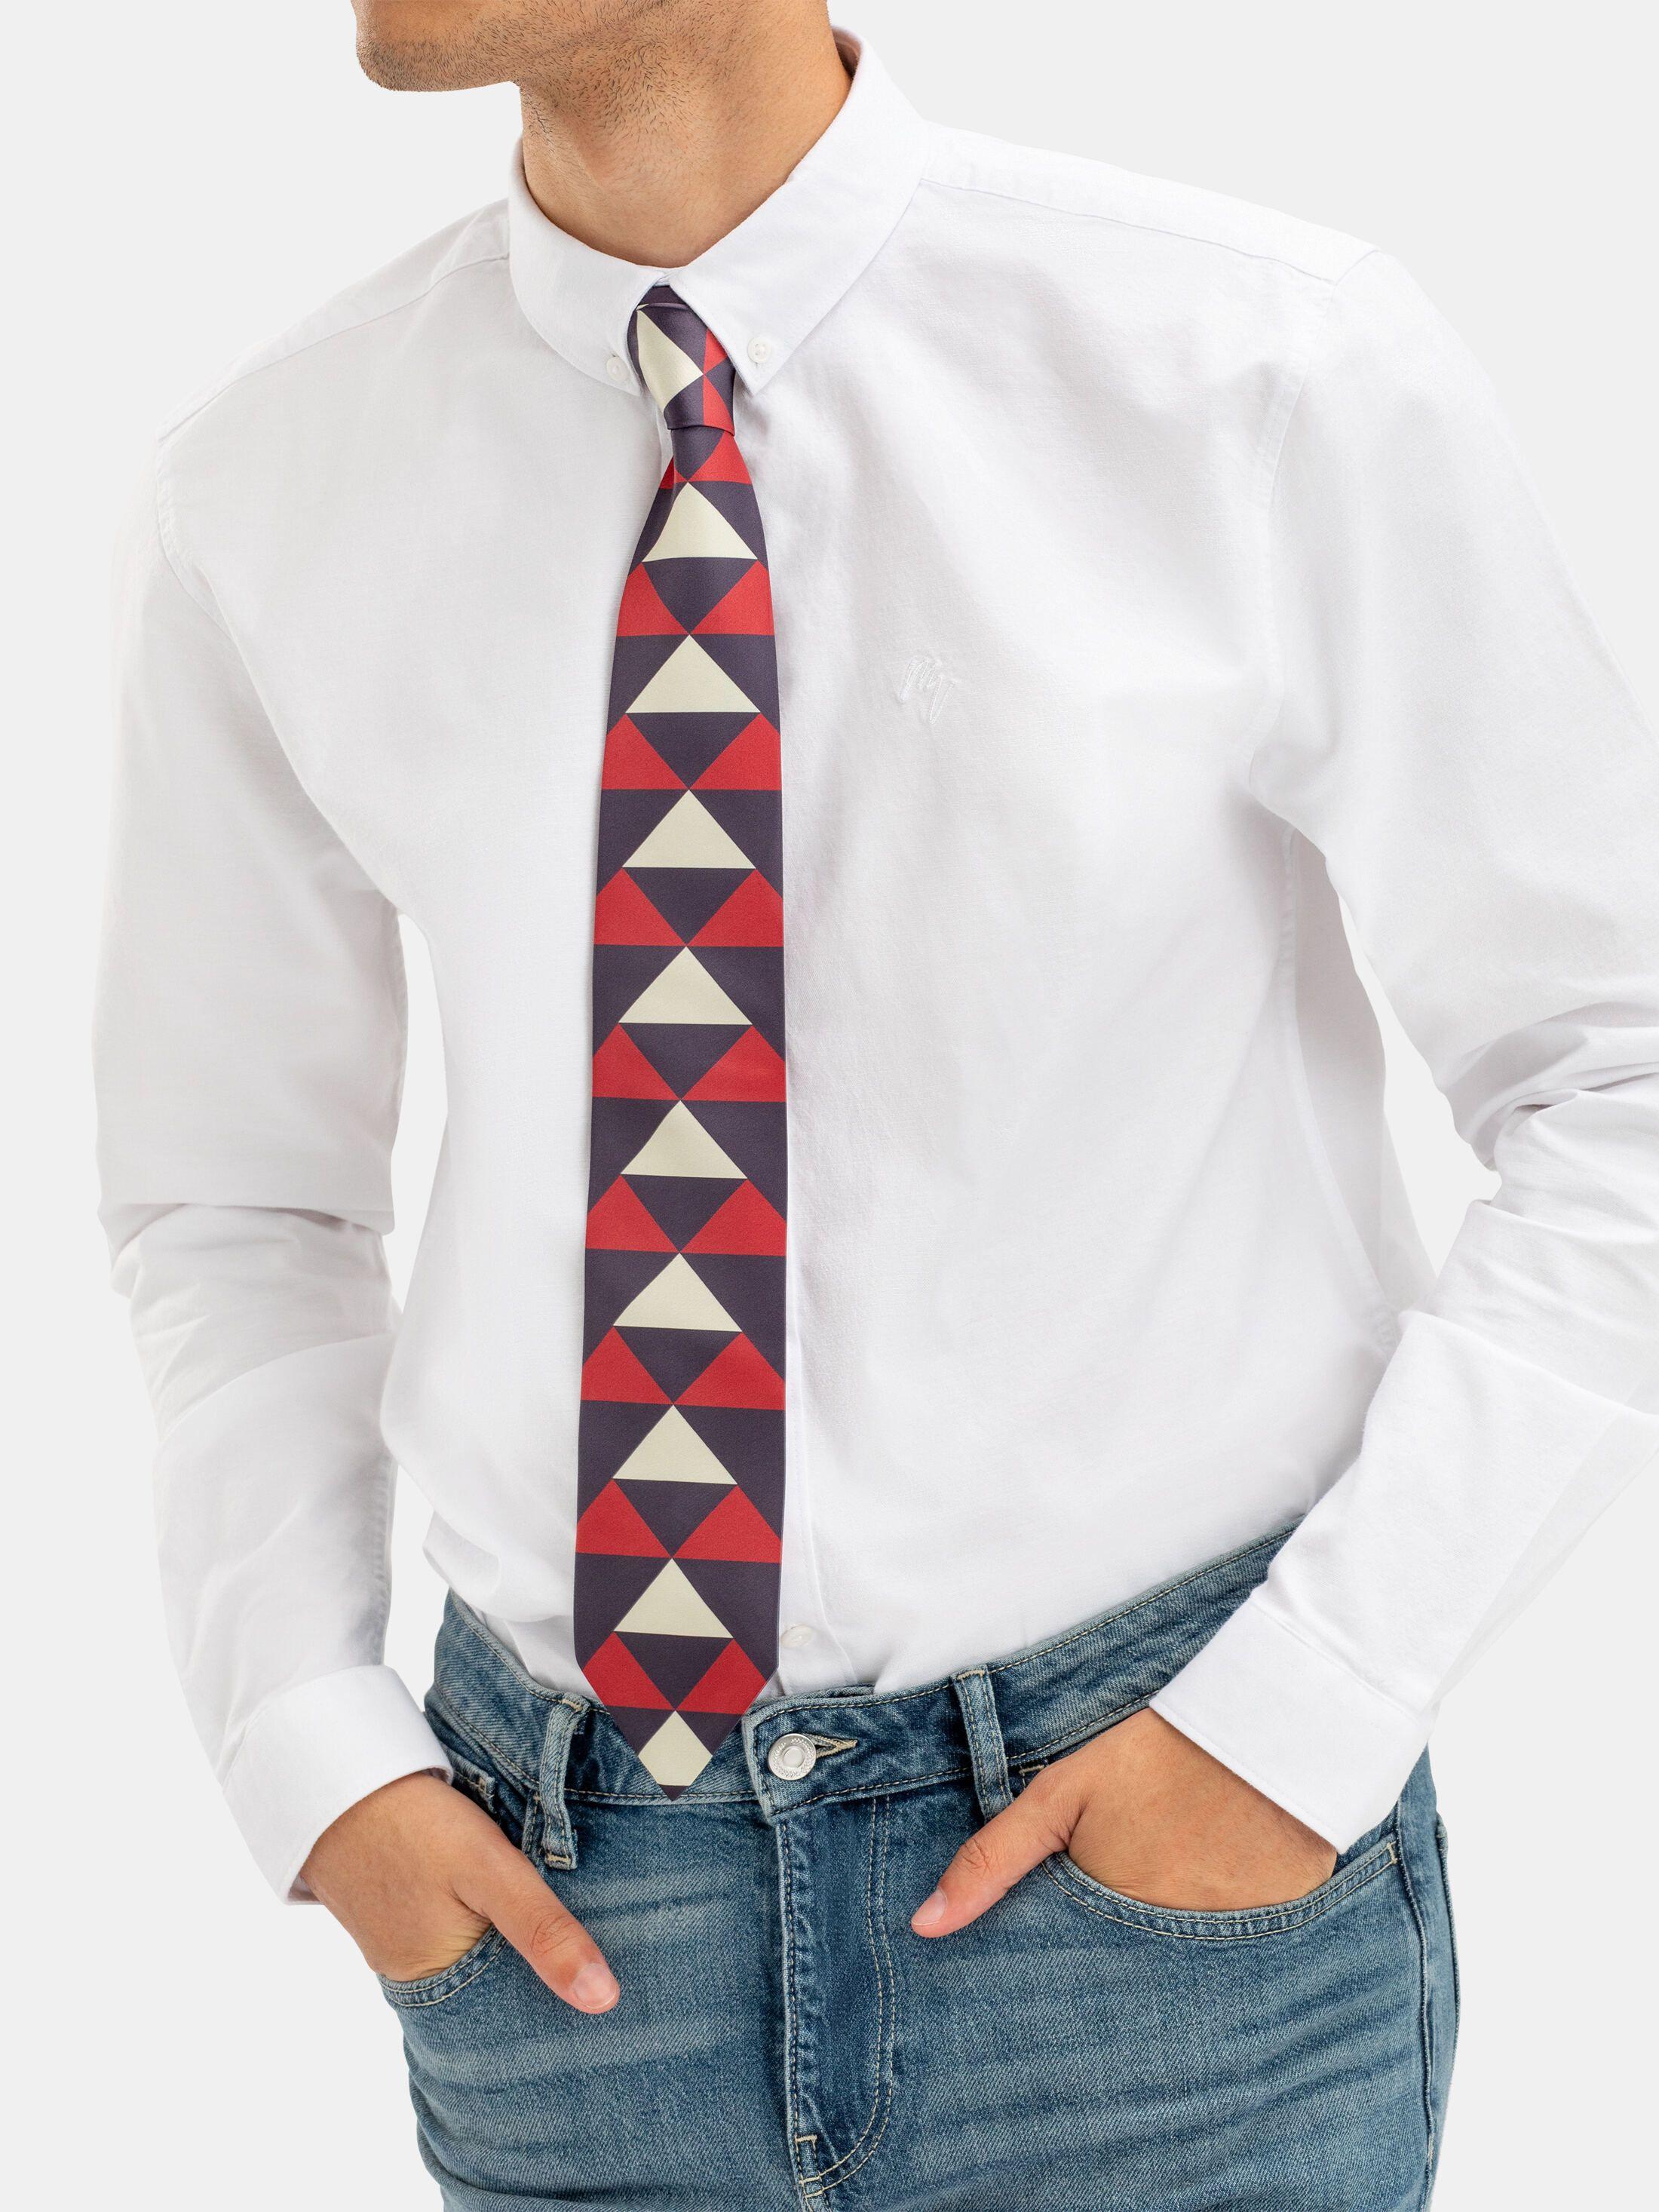 cravatte personalizzate online